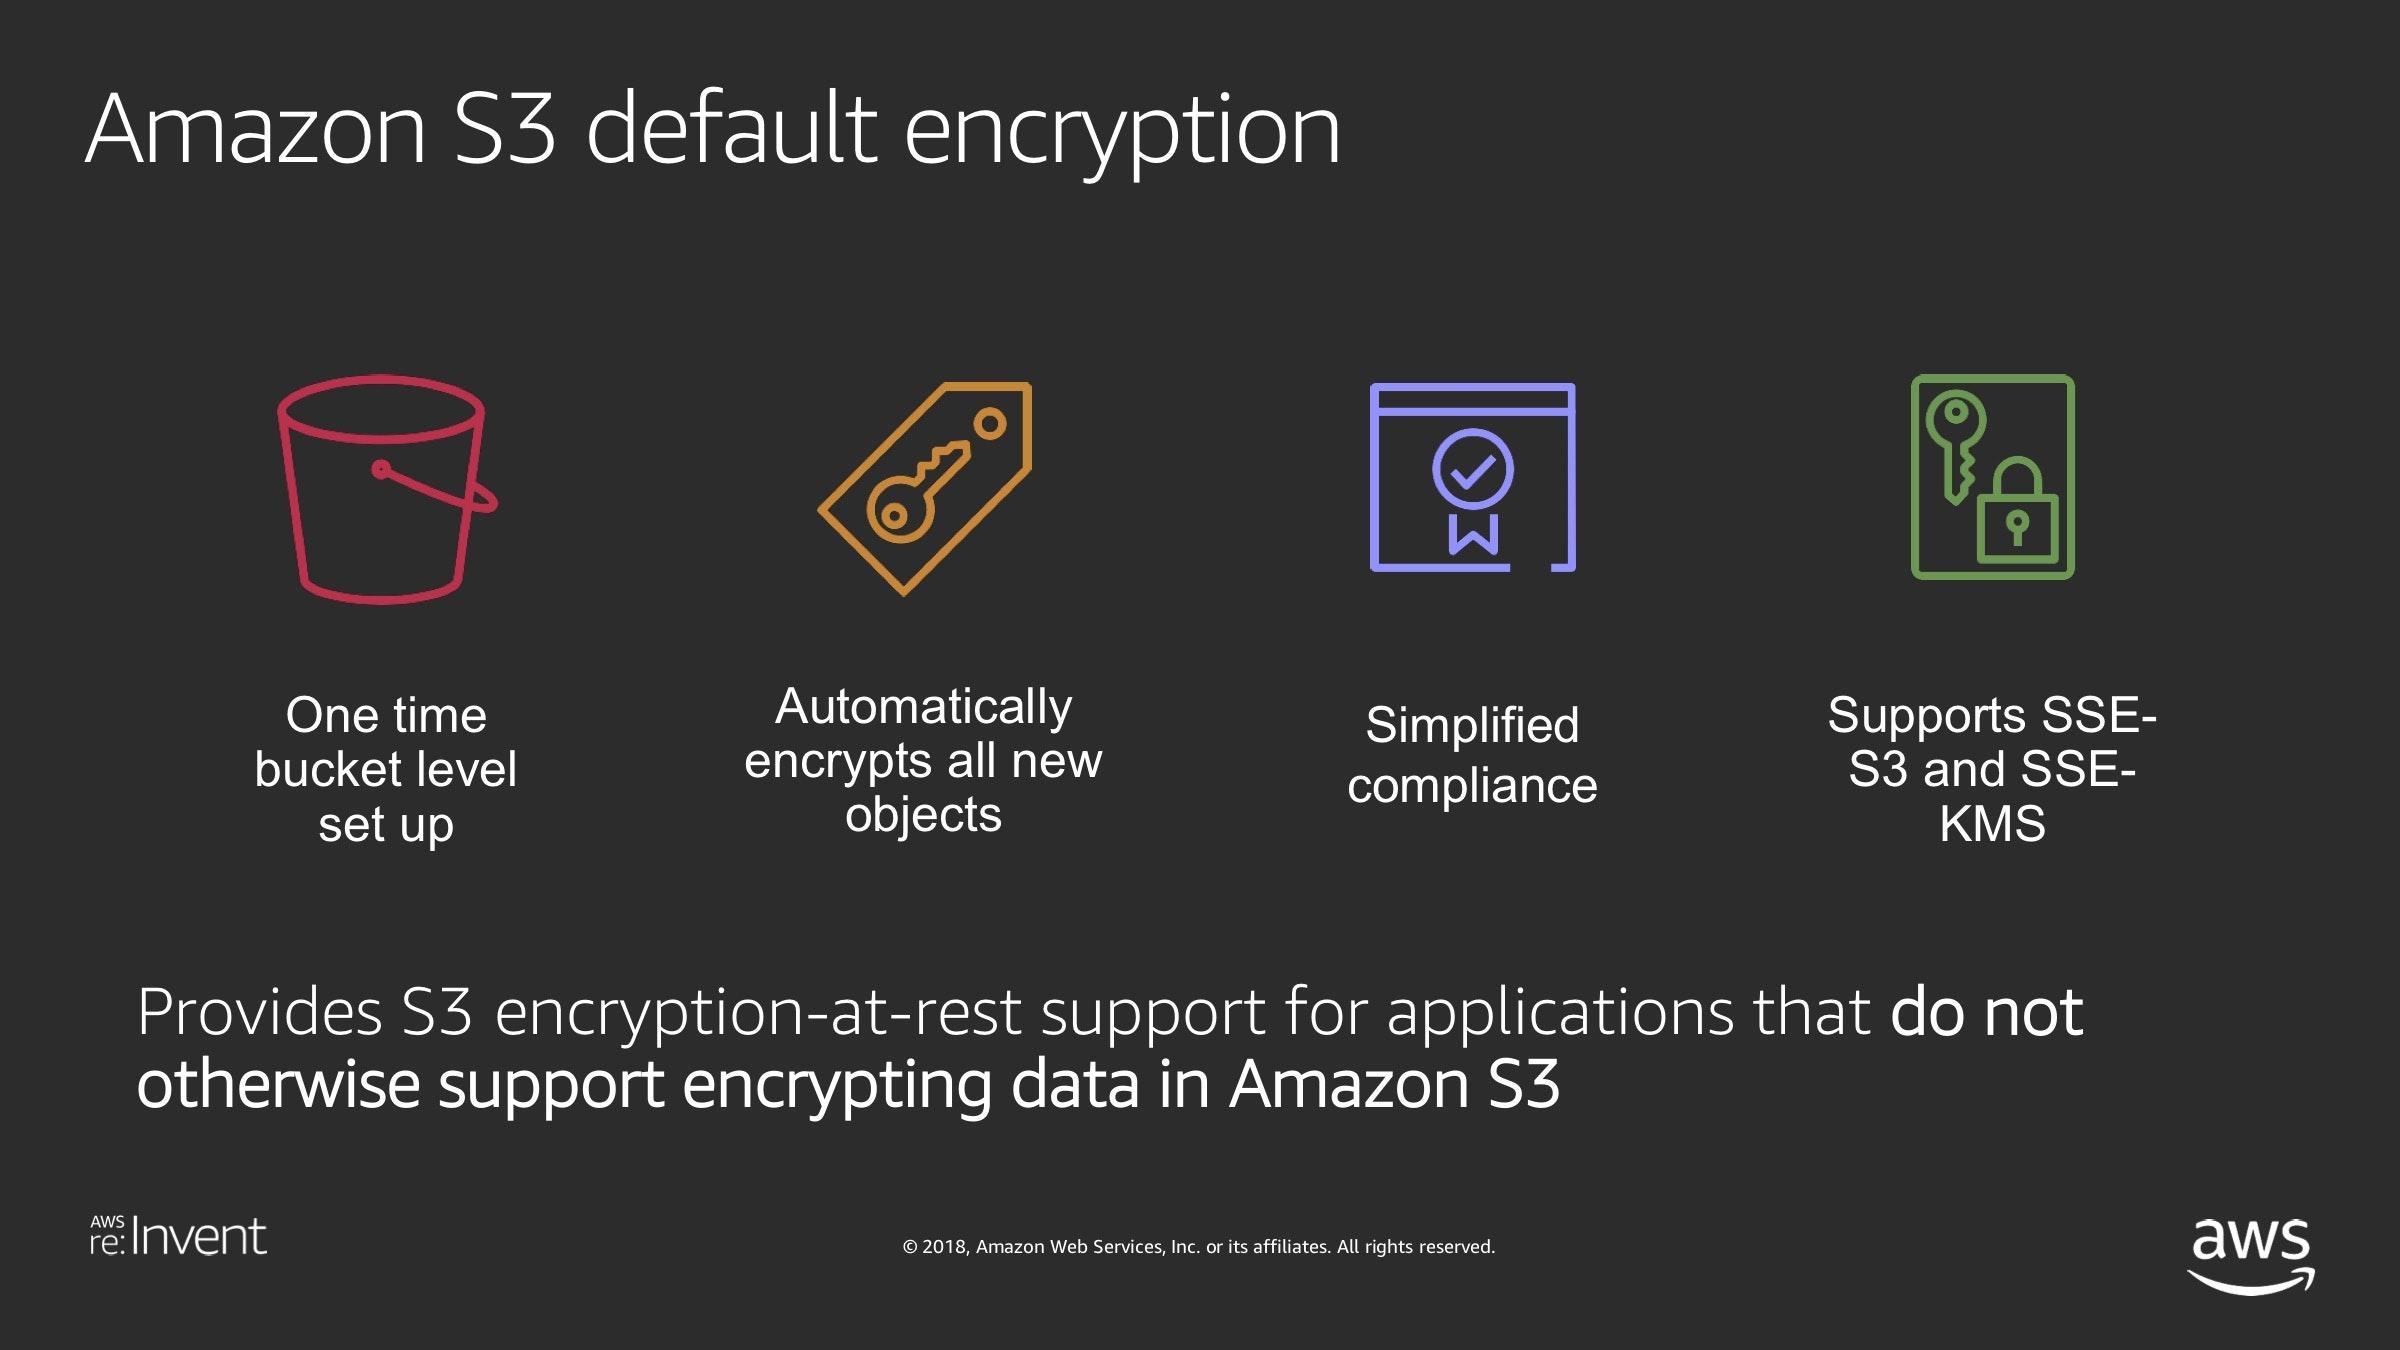 deep-dive-on-amazon-s3-default-encryption.jpg